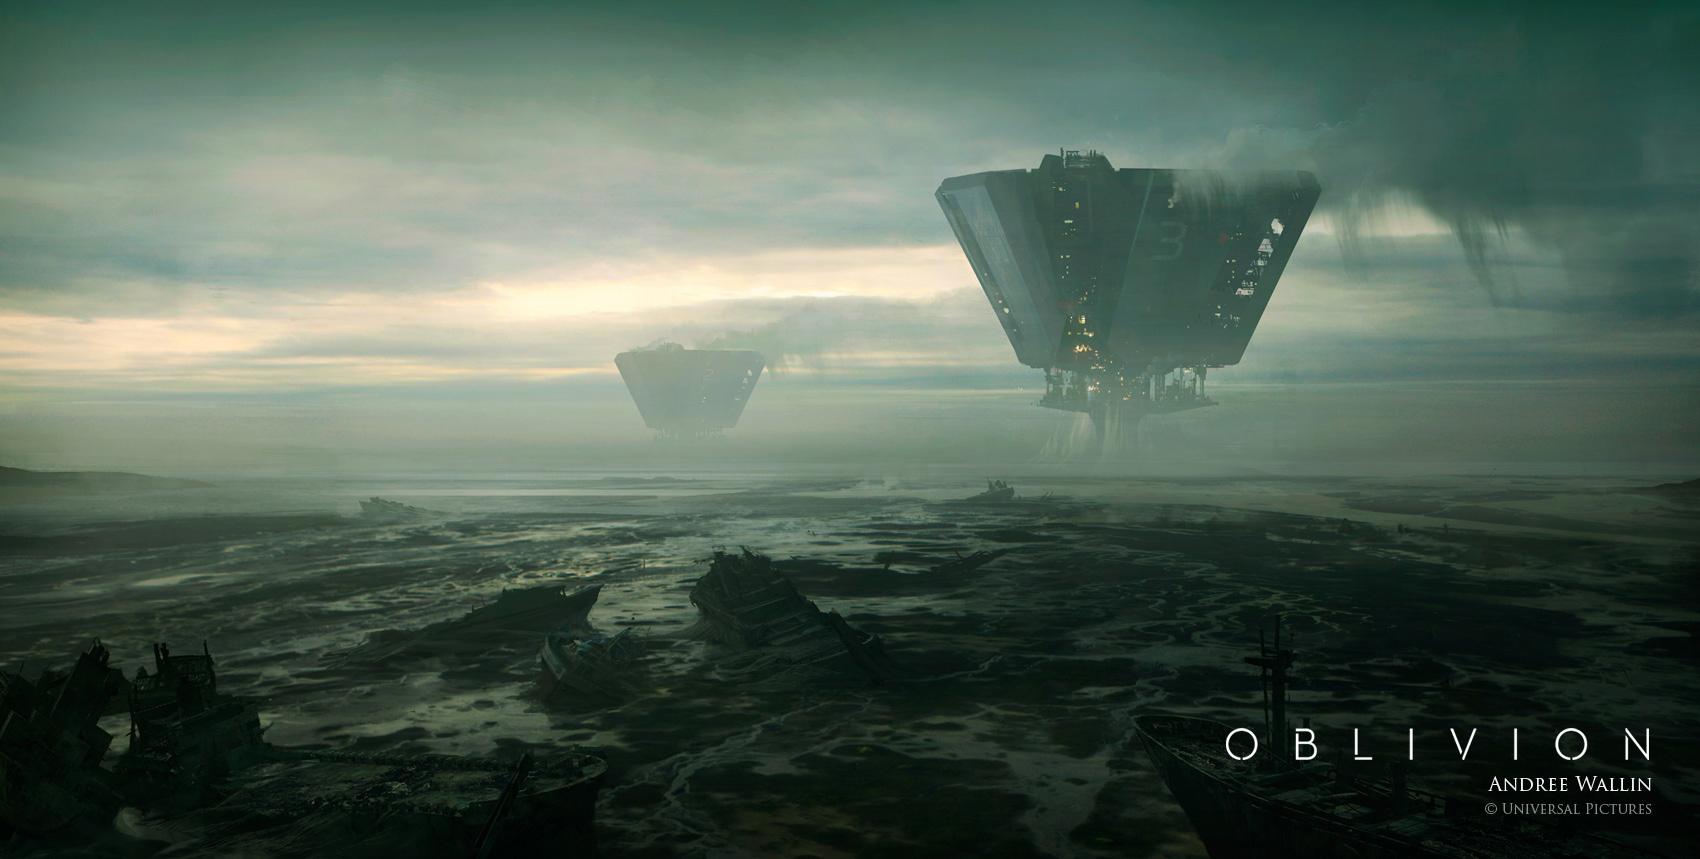 Oblivion Wallpaper and Background Image